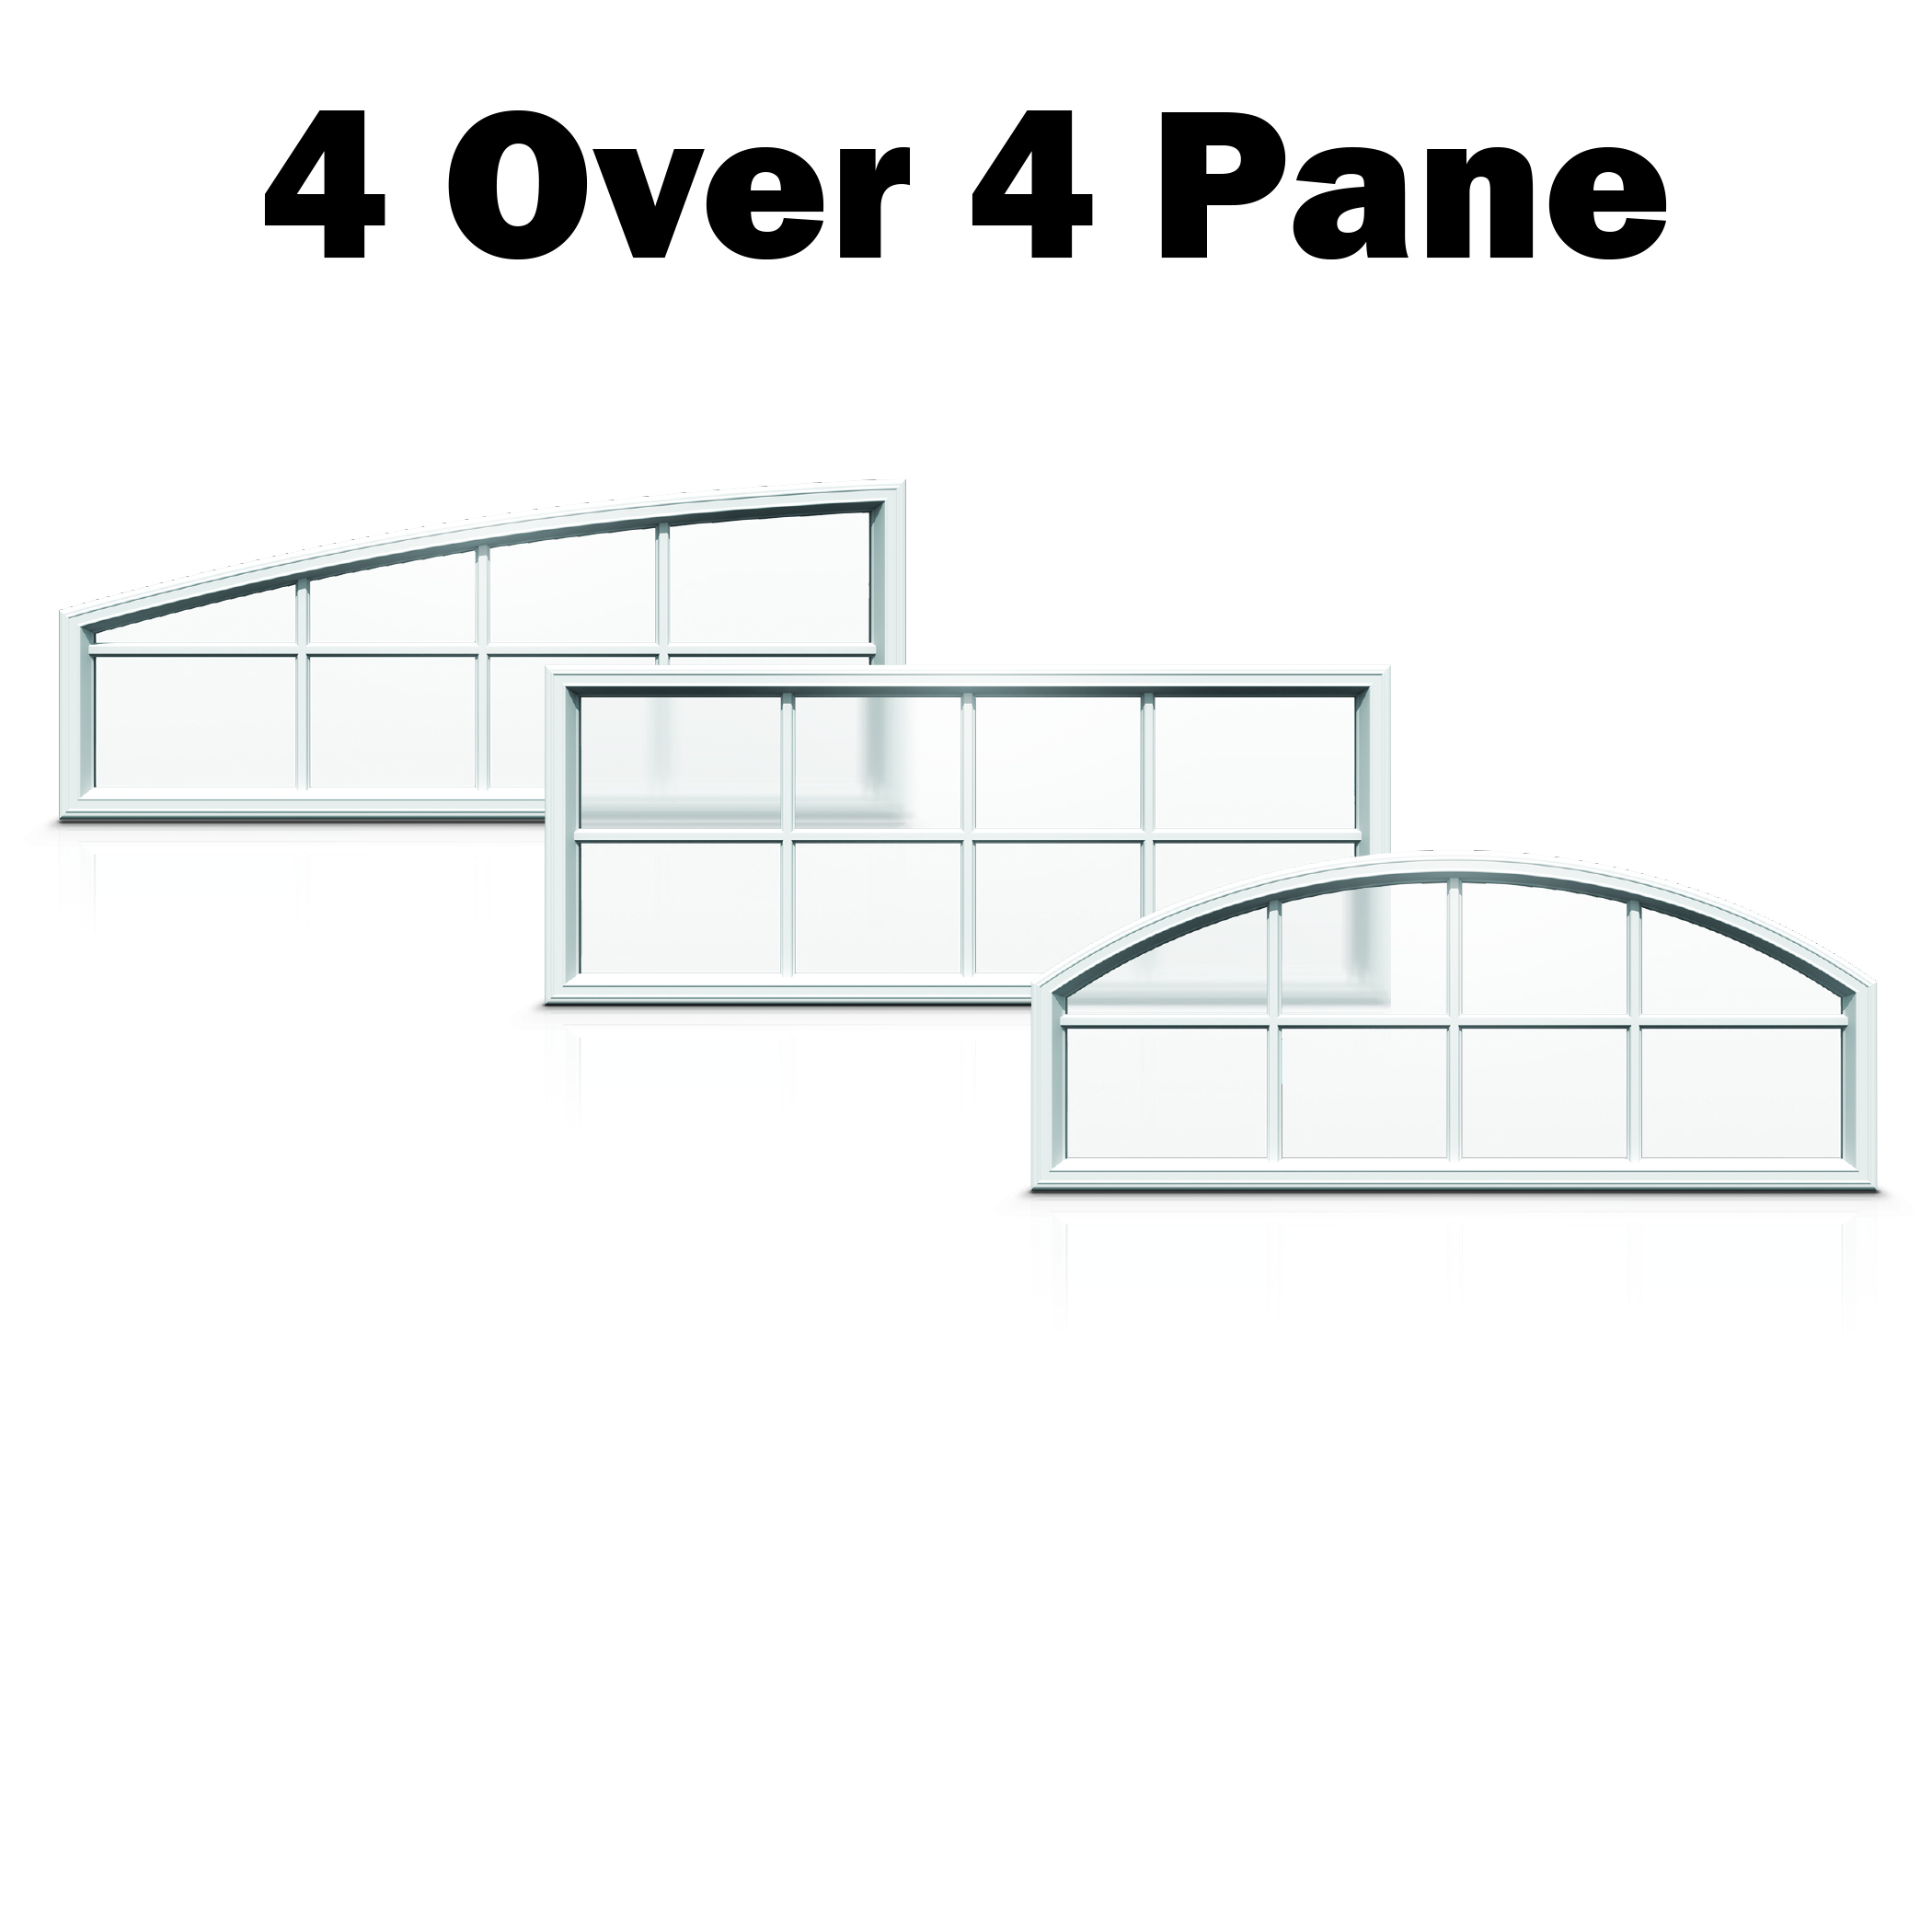 4 Over 4 Pane - Briarcrest.jpg